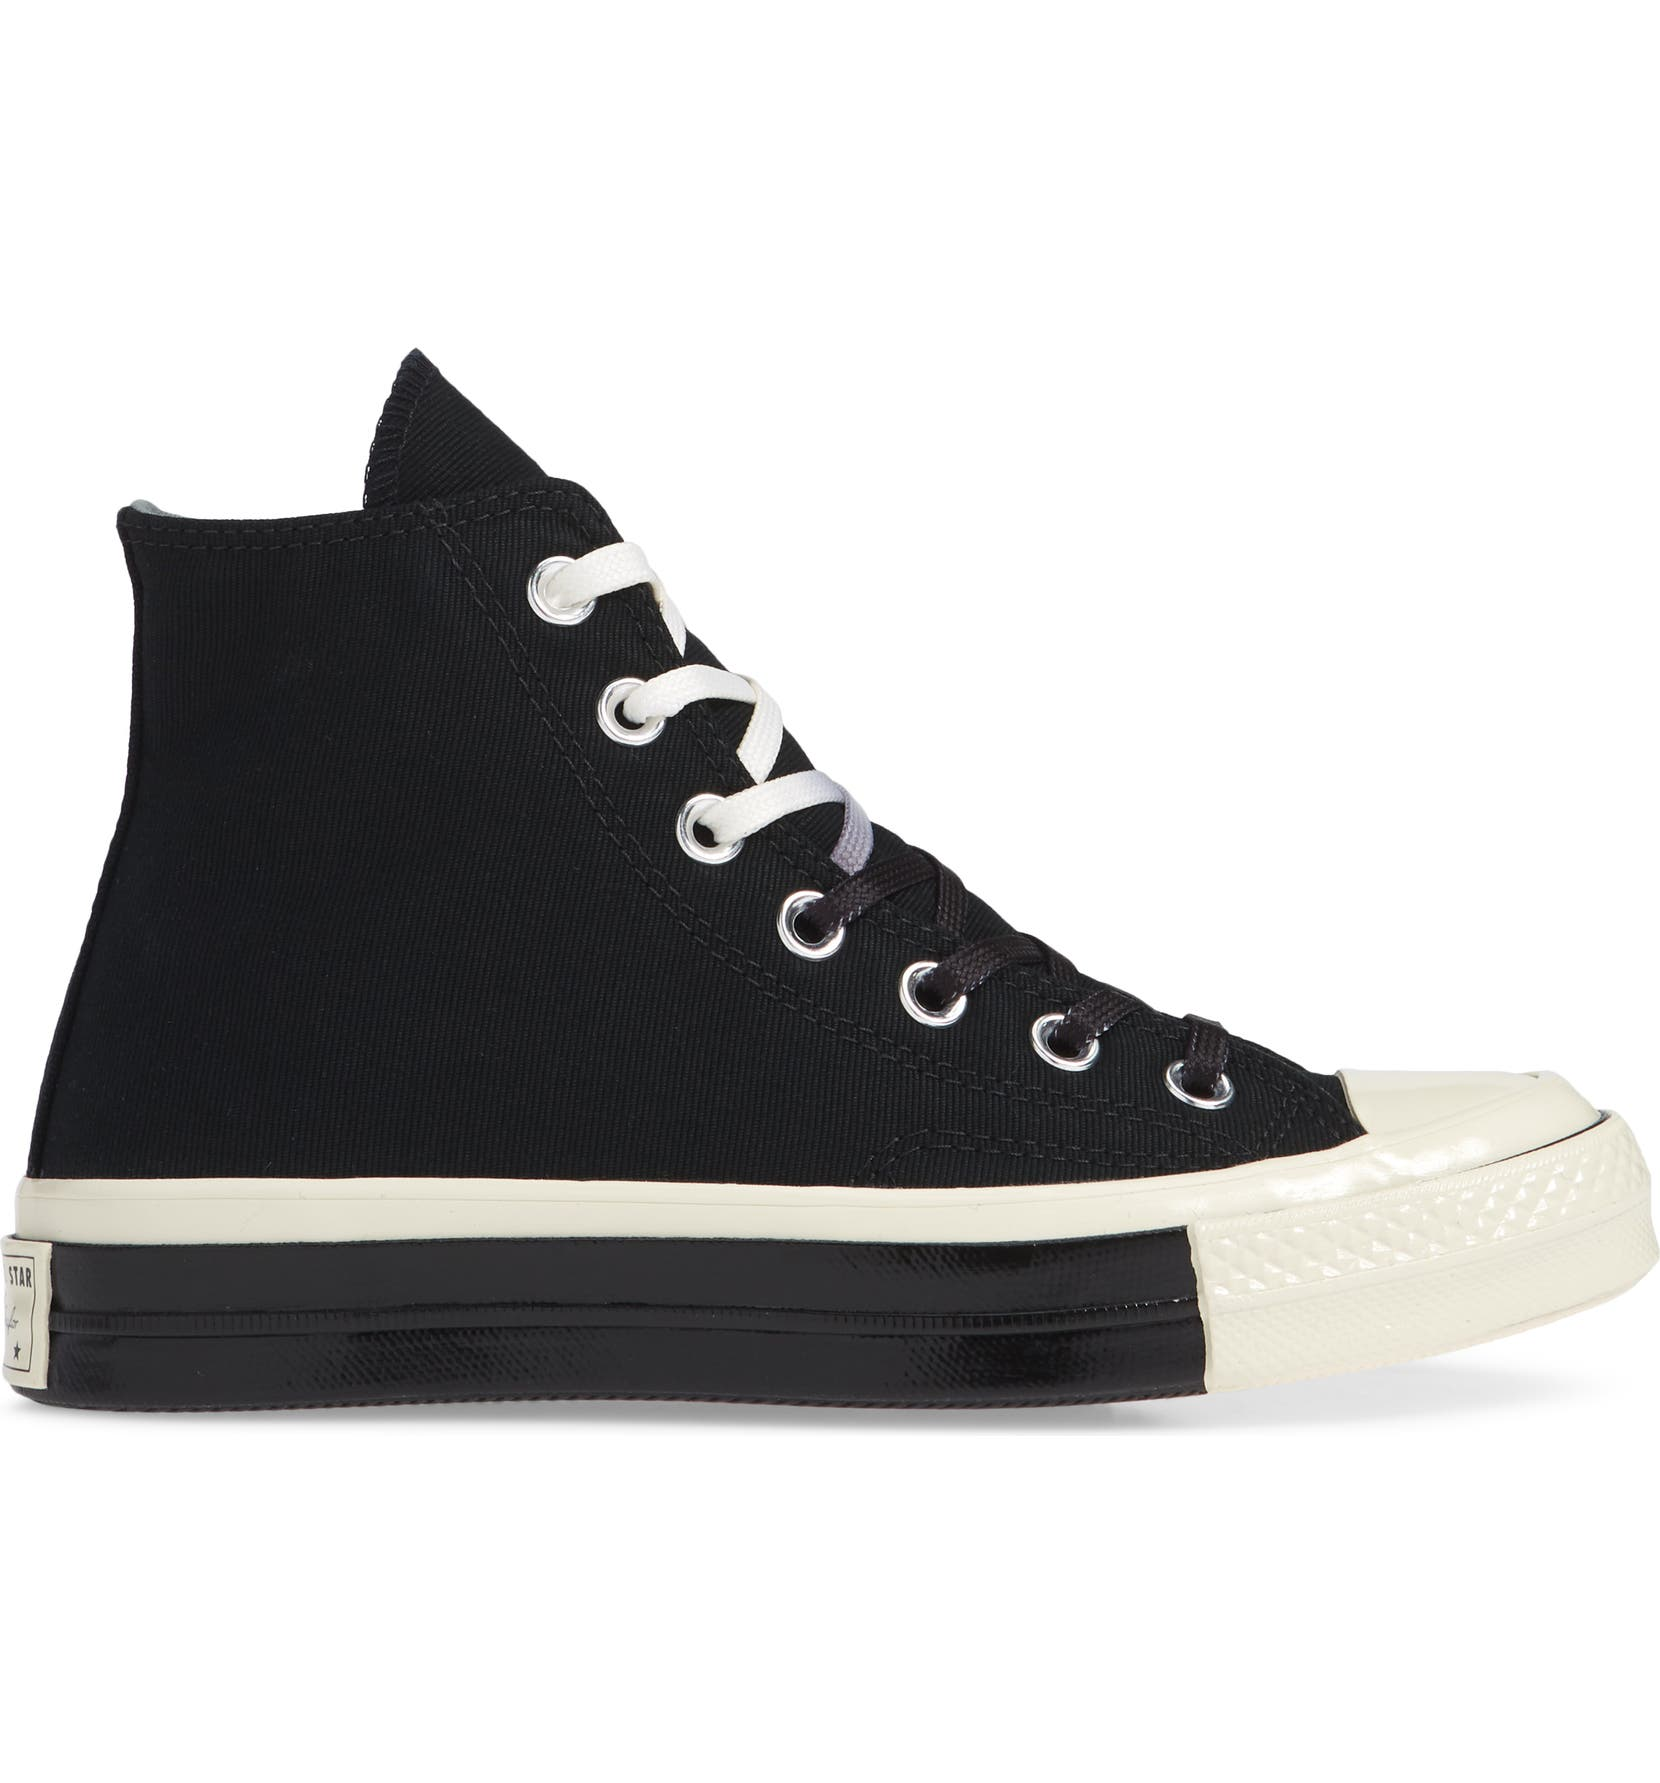 722266e2d31 Converse Chuck Taylor® All Star® 70 Colorblock High Top Sneaker (Women)